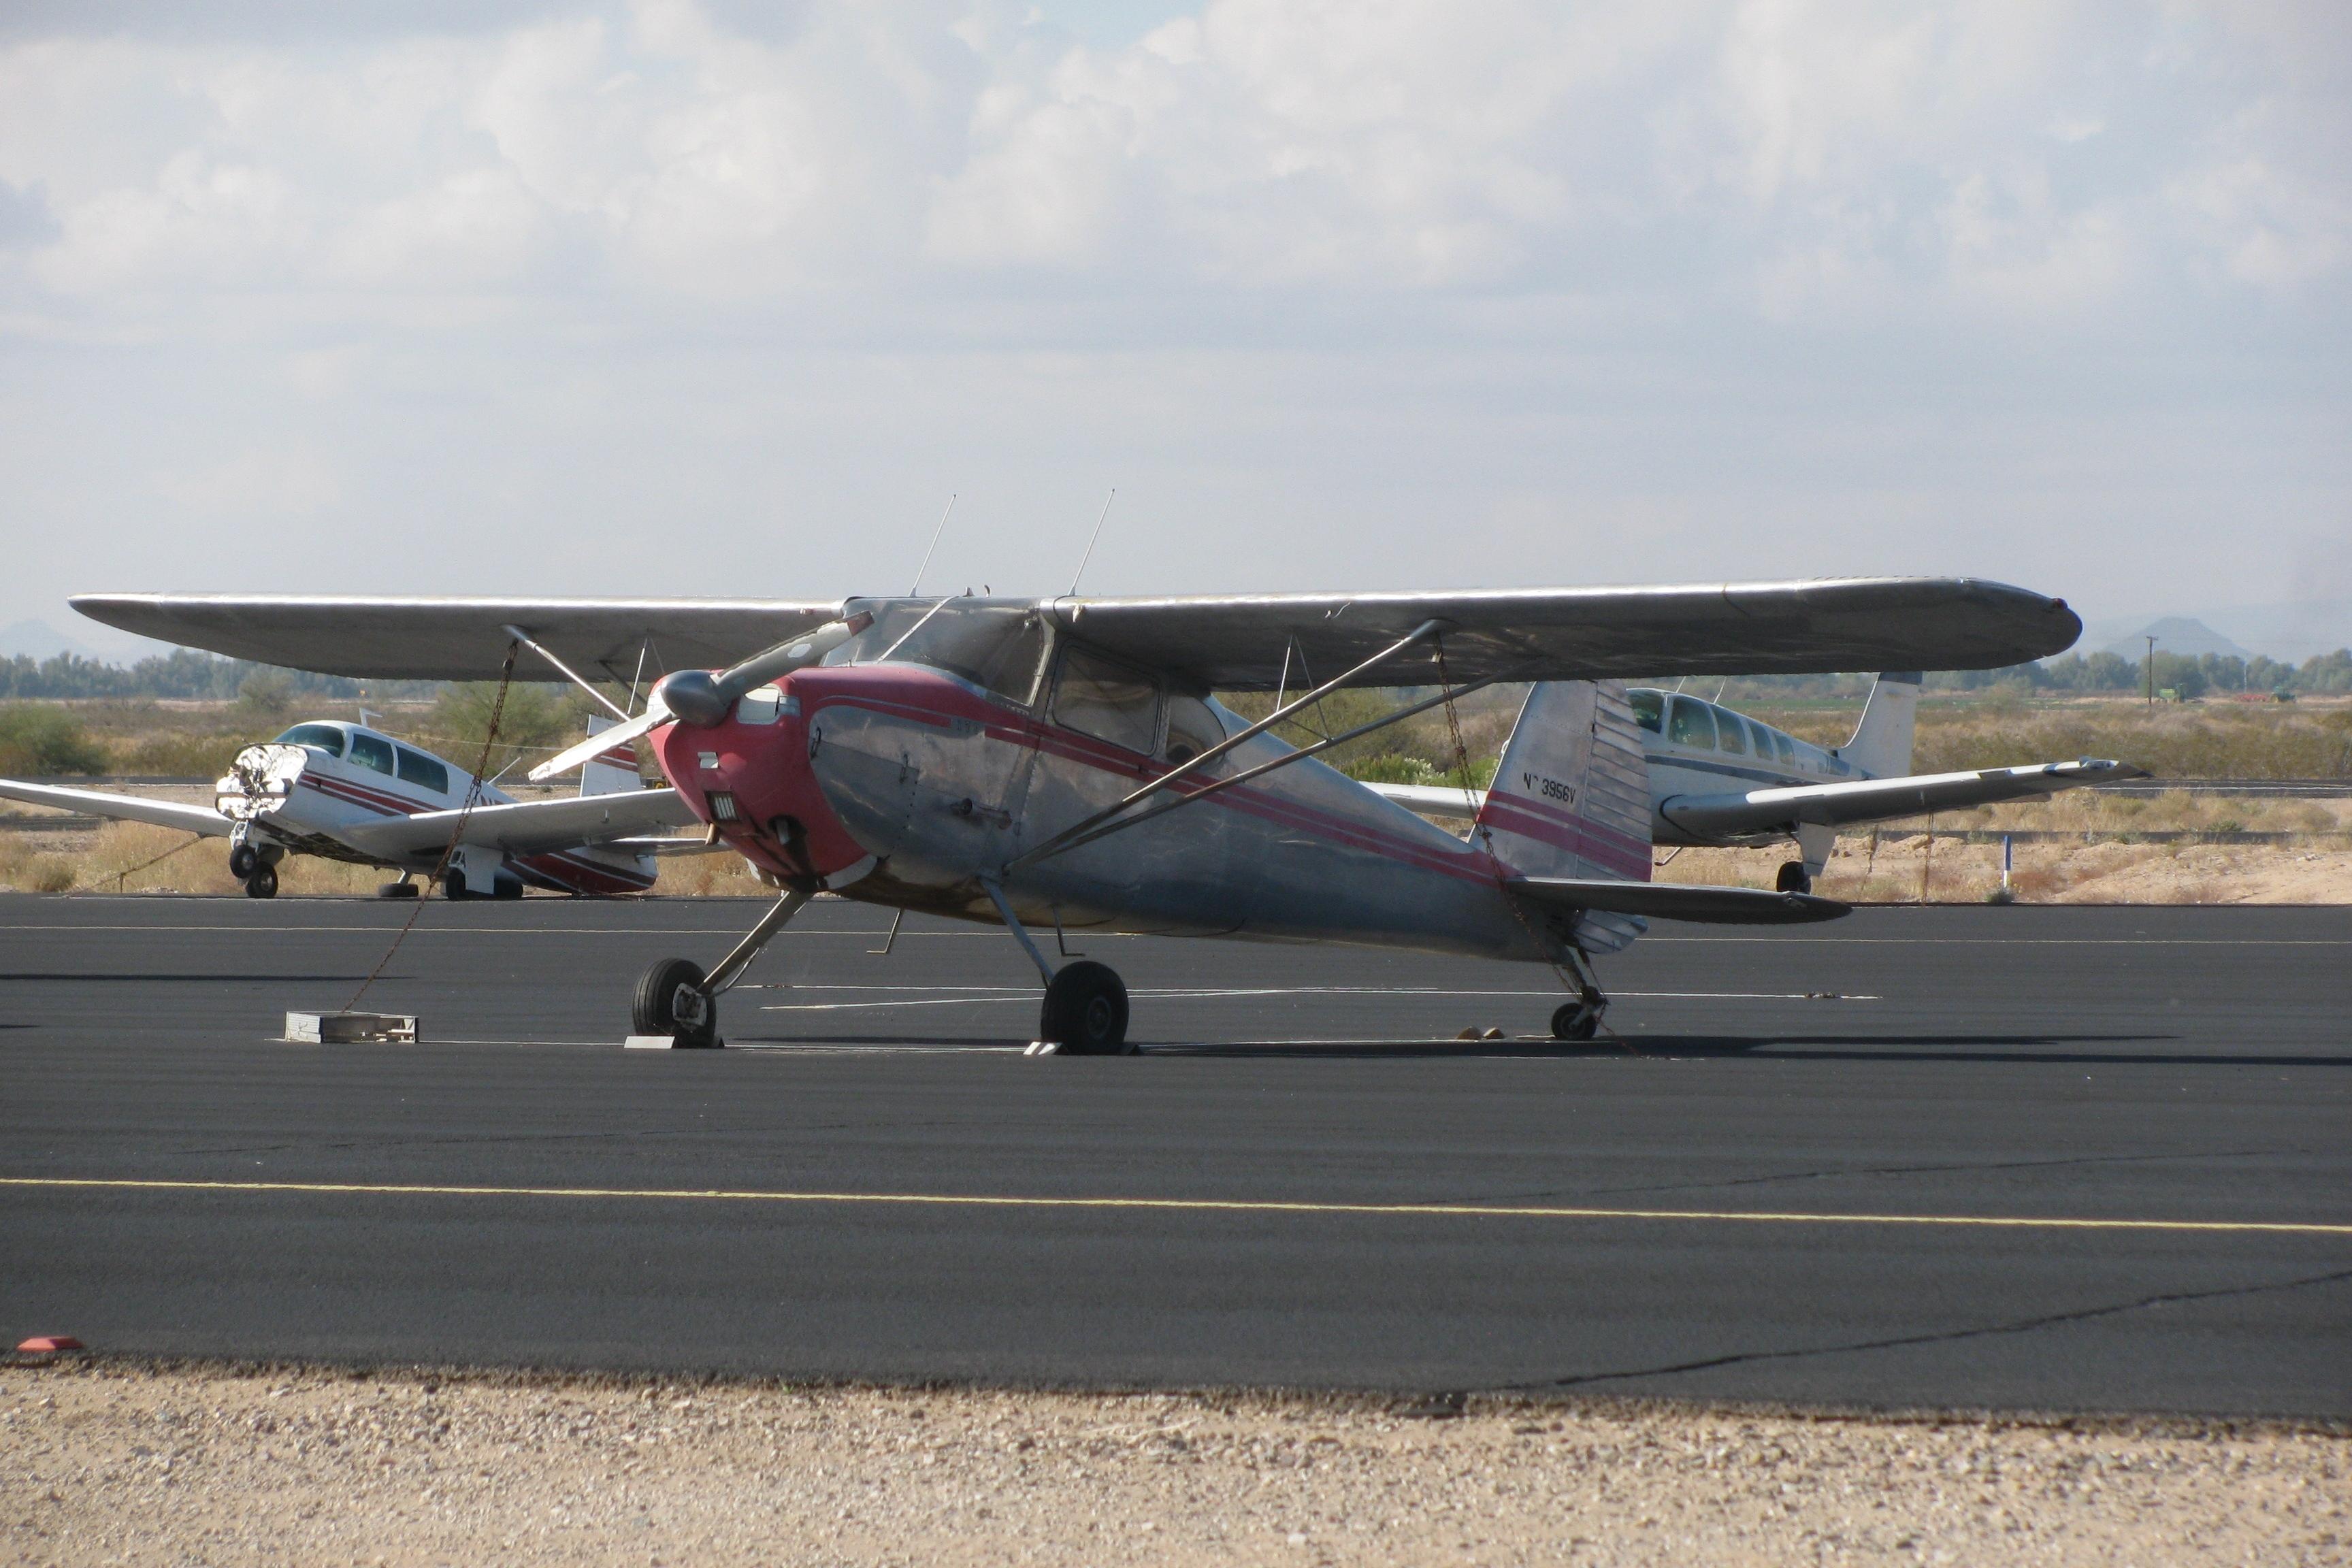 Cessna 170, Single-engine four-seat cabin monoplane, USA